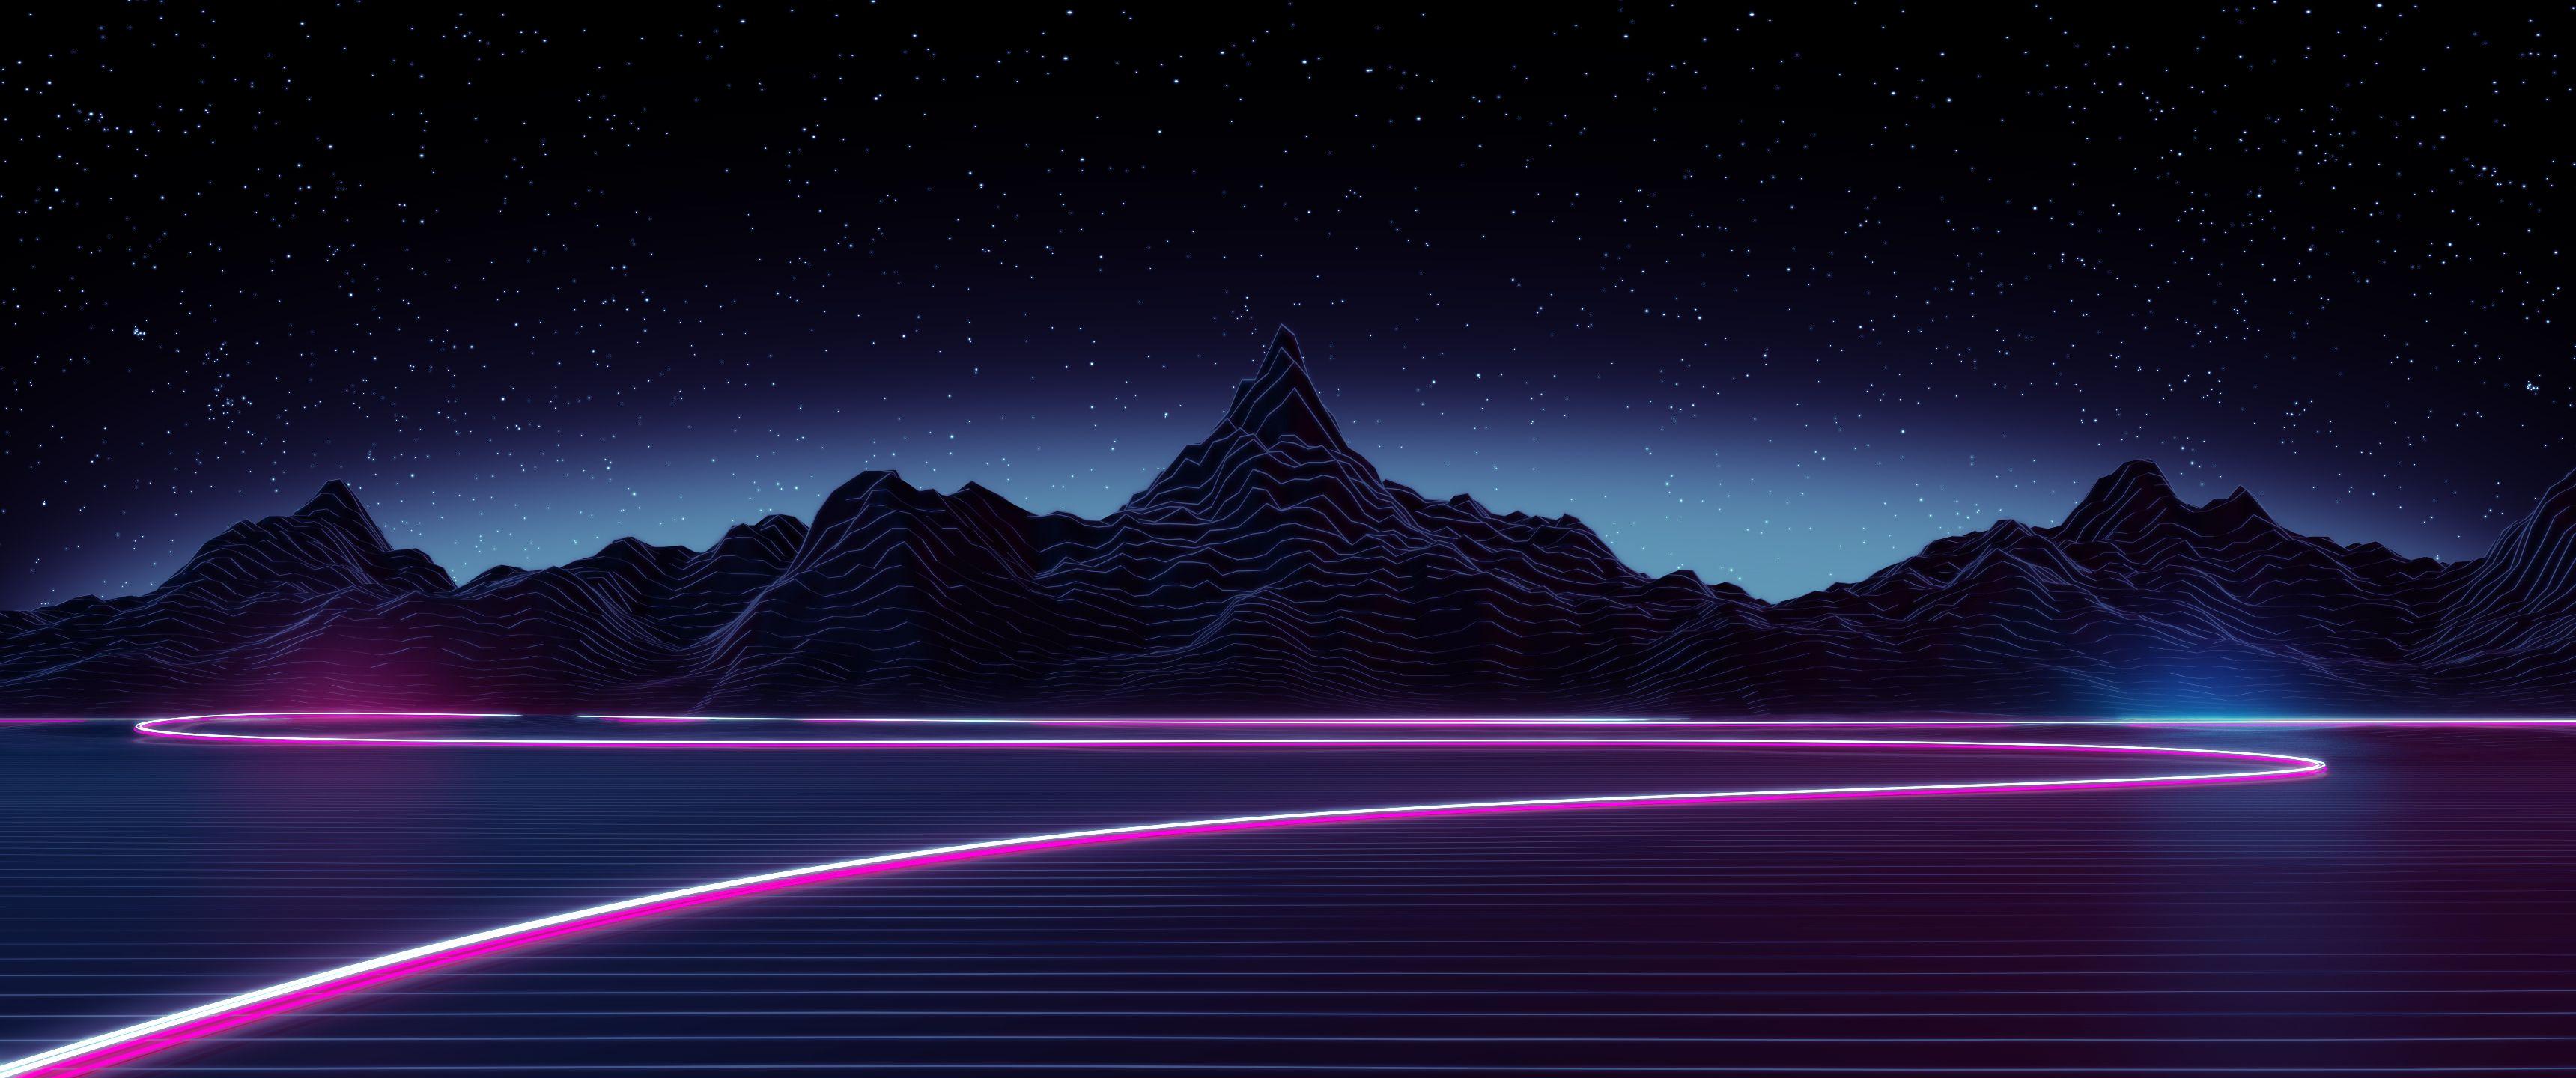 Untitled Album On Imgur Vaporwave Wallpaper Neon Wallpaper Aesthetic Wallpapers